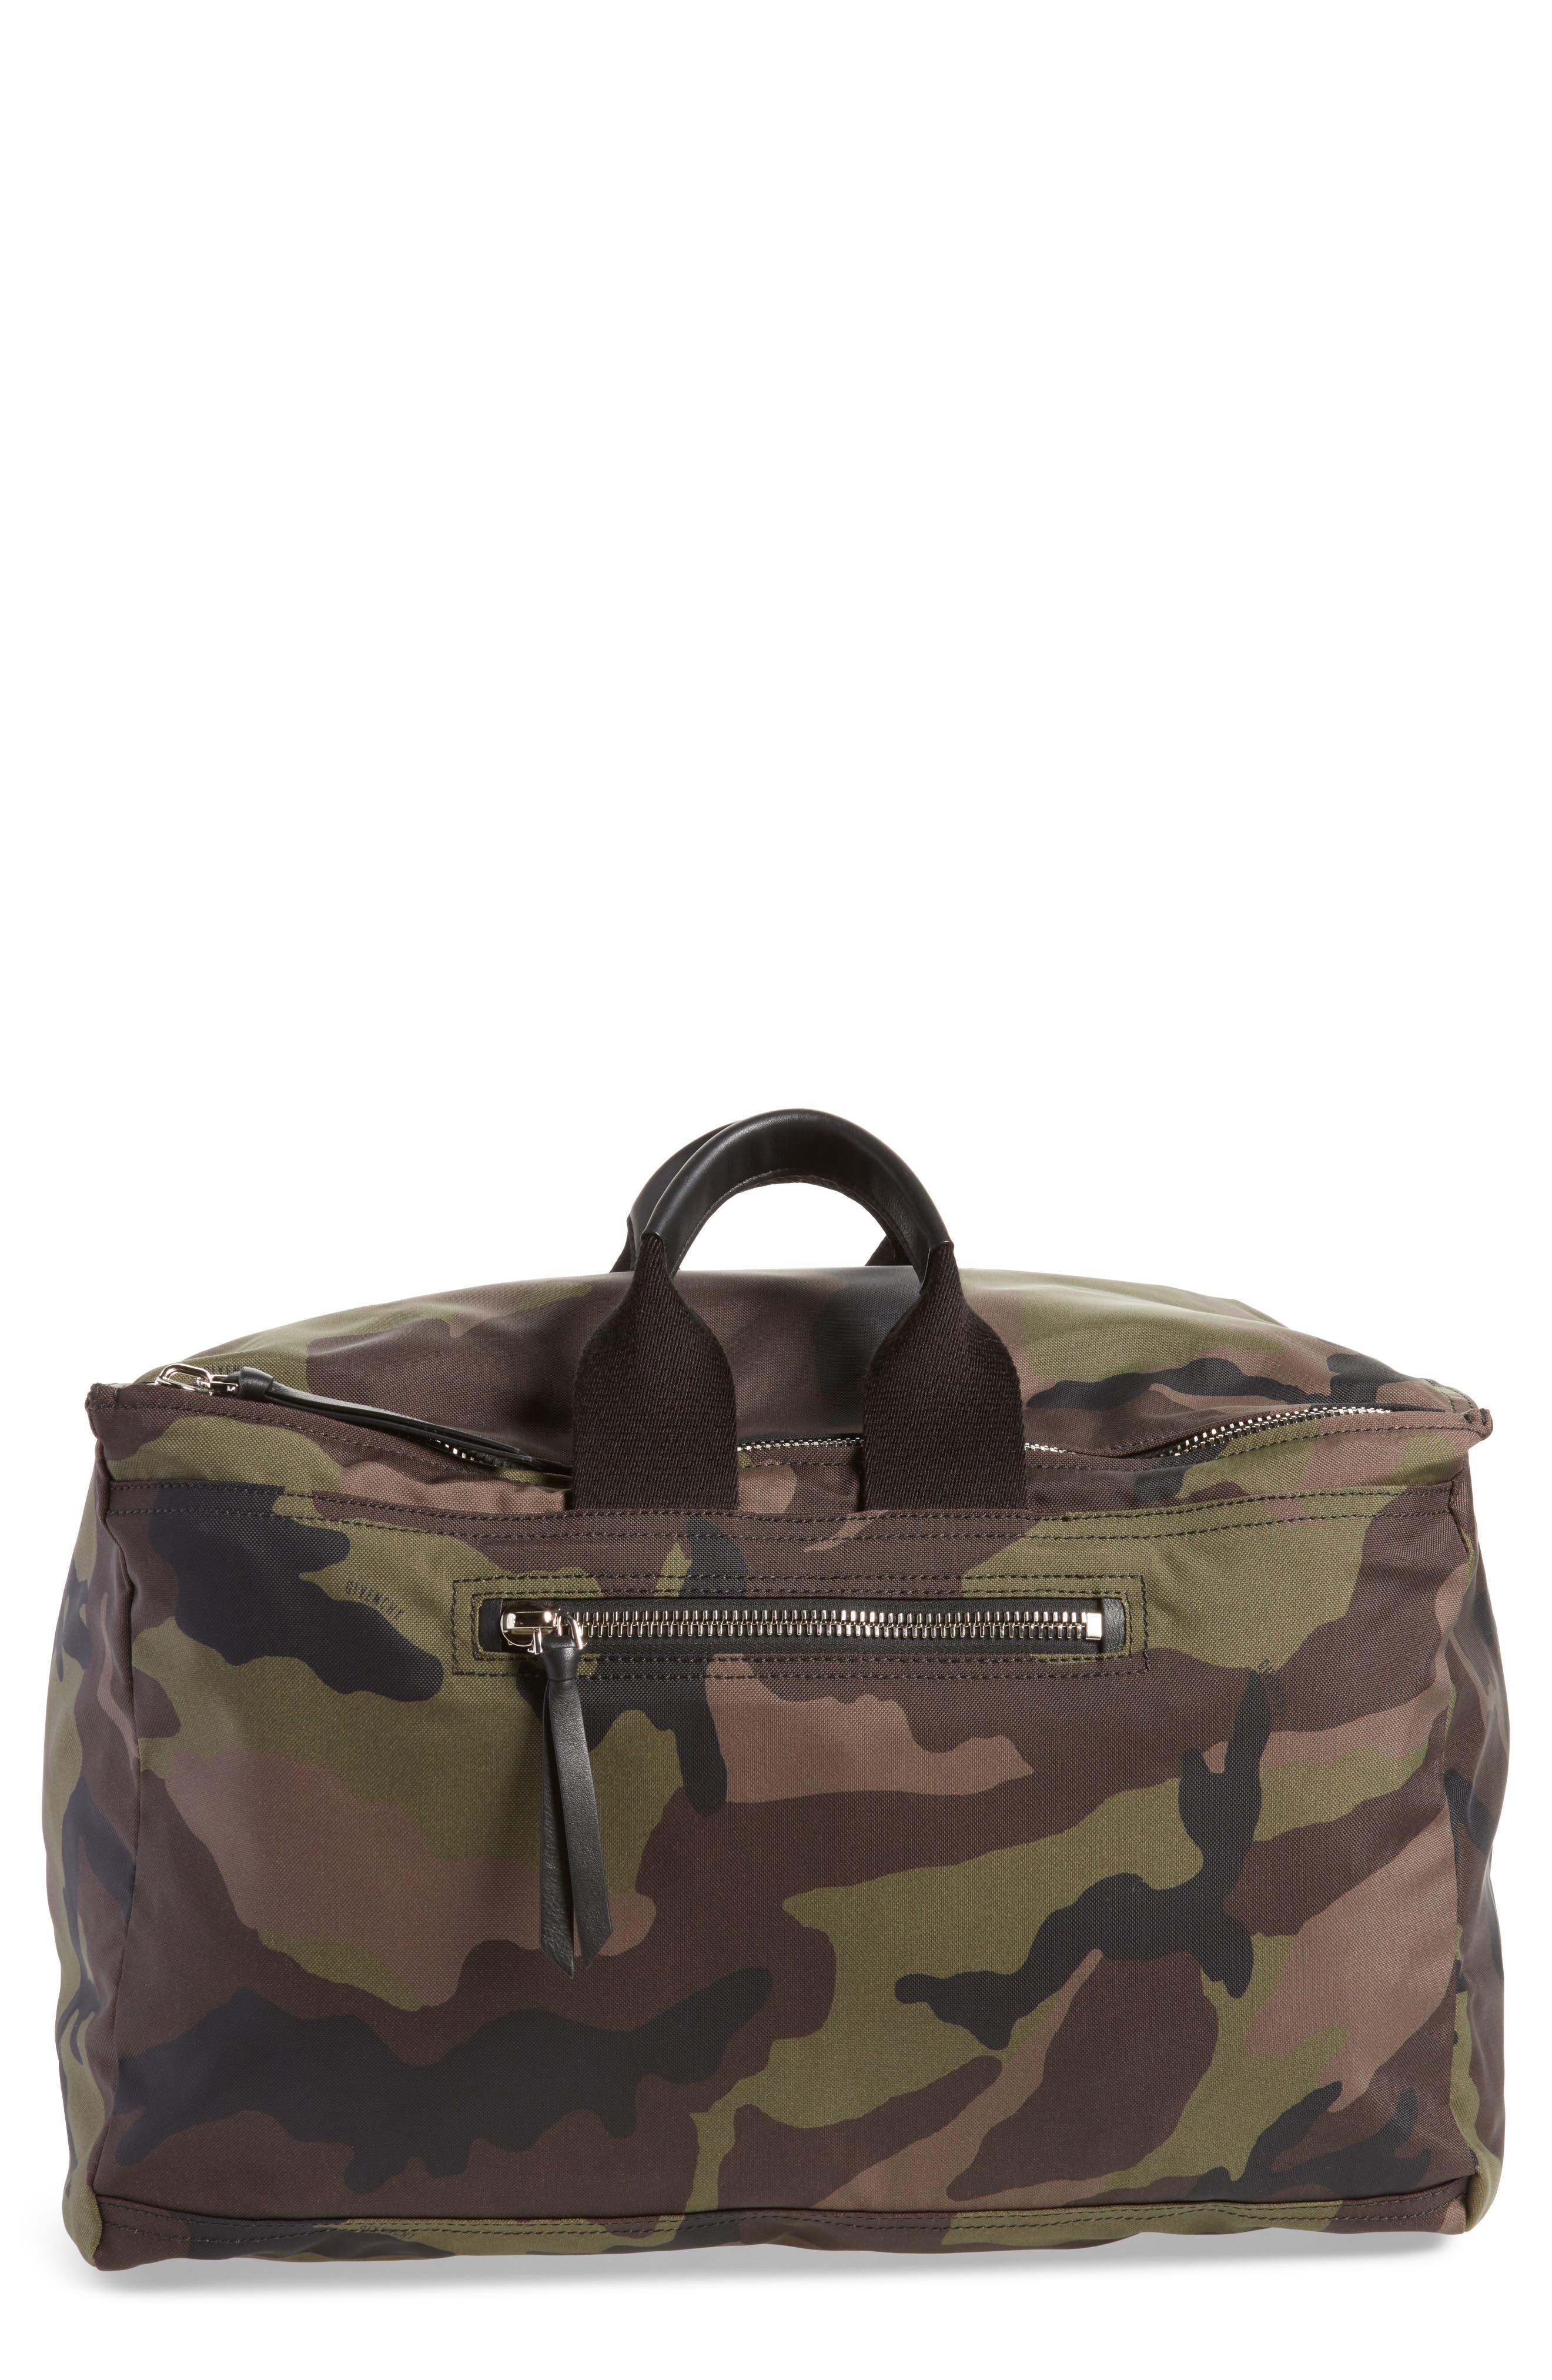 Pandora Camo Convertible Backpack,                             Main thumbnail 1, color,                             Multicolored